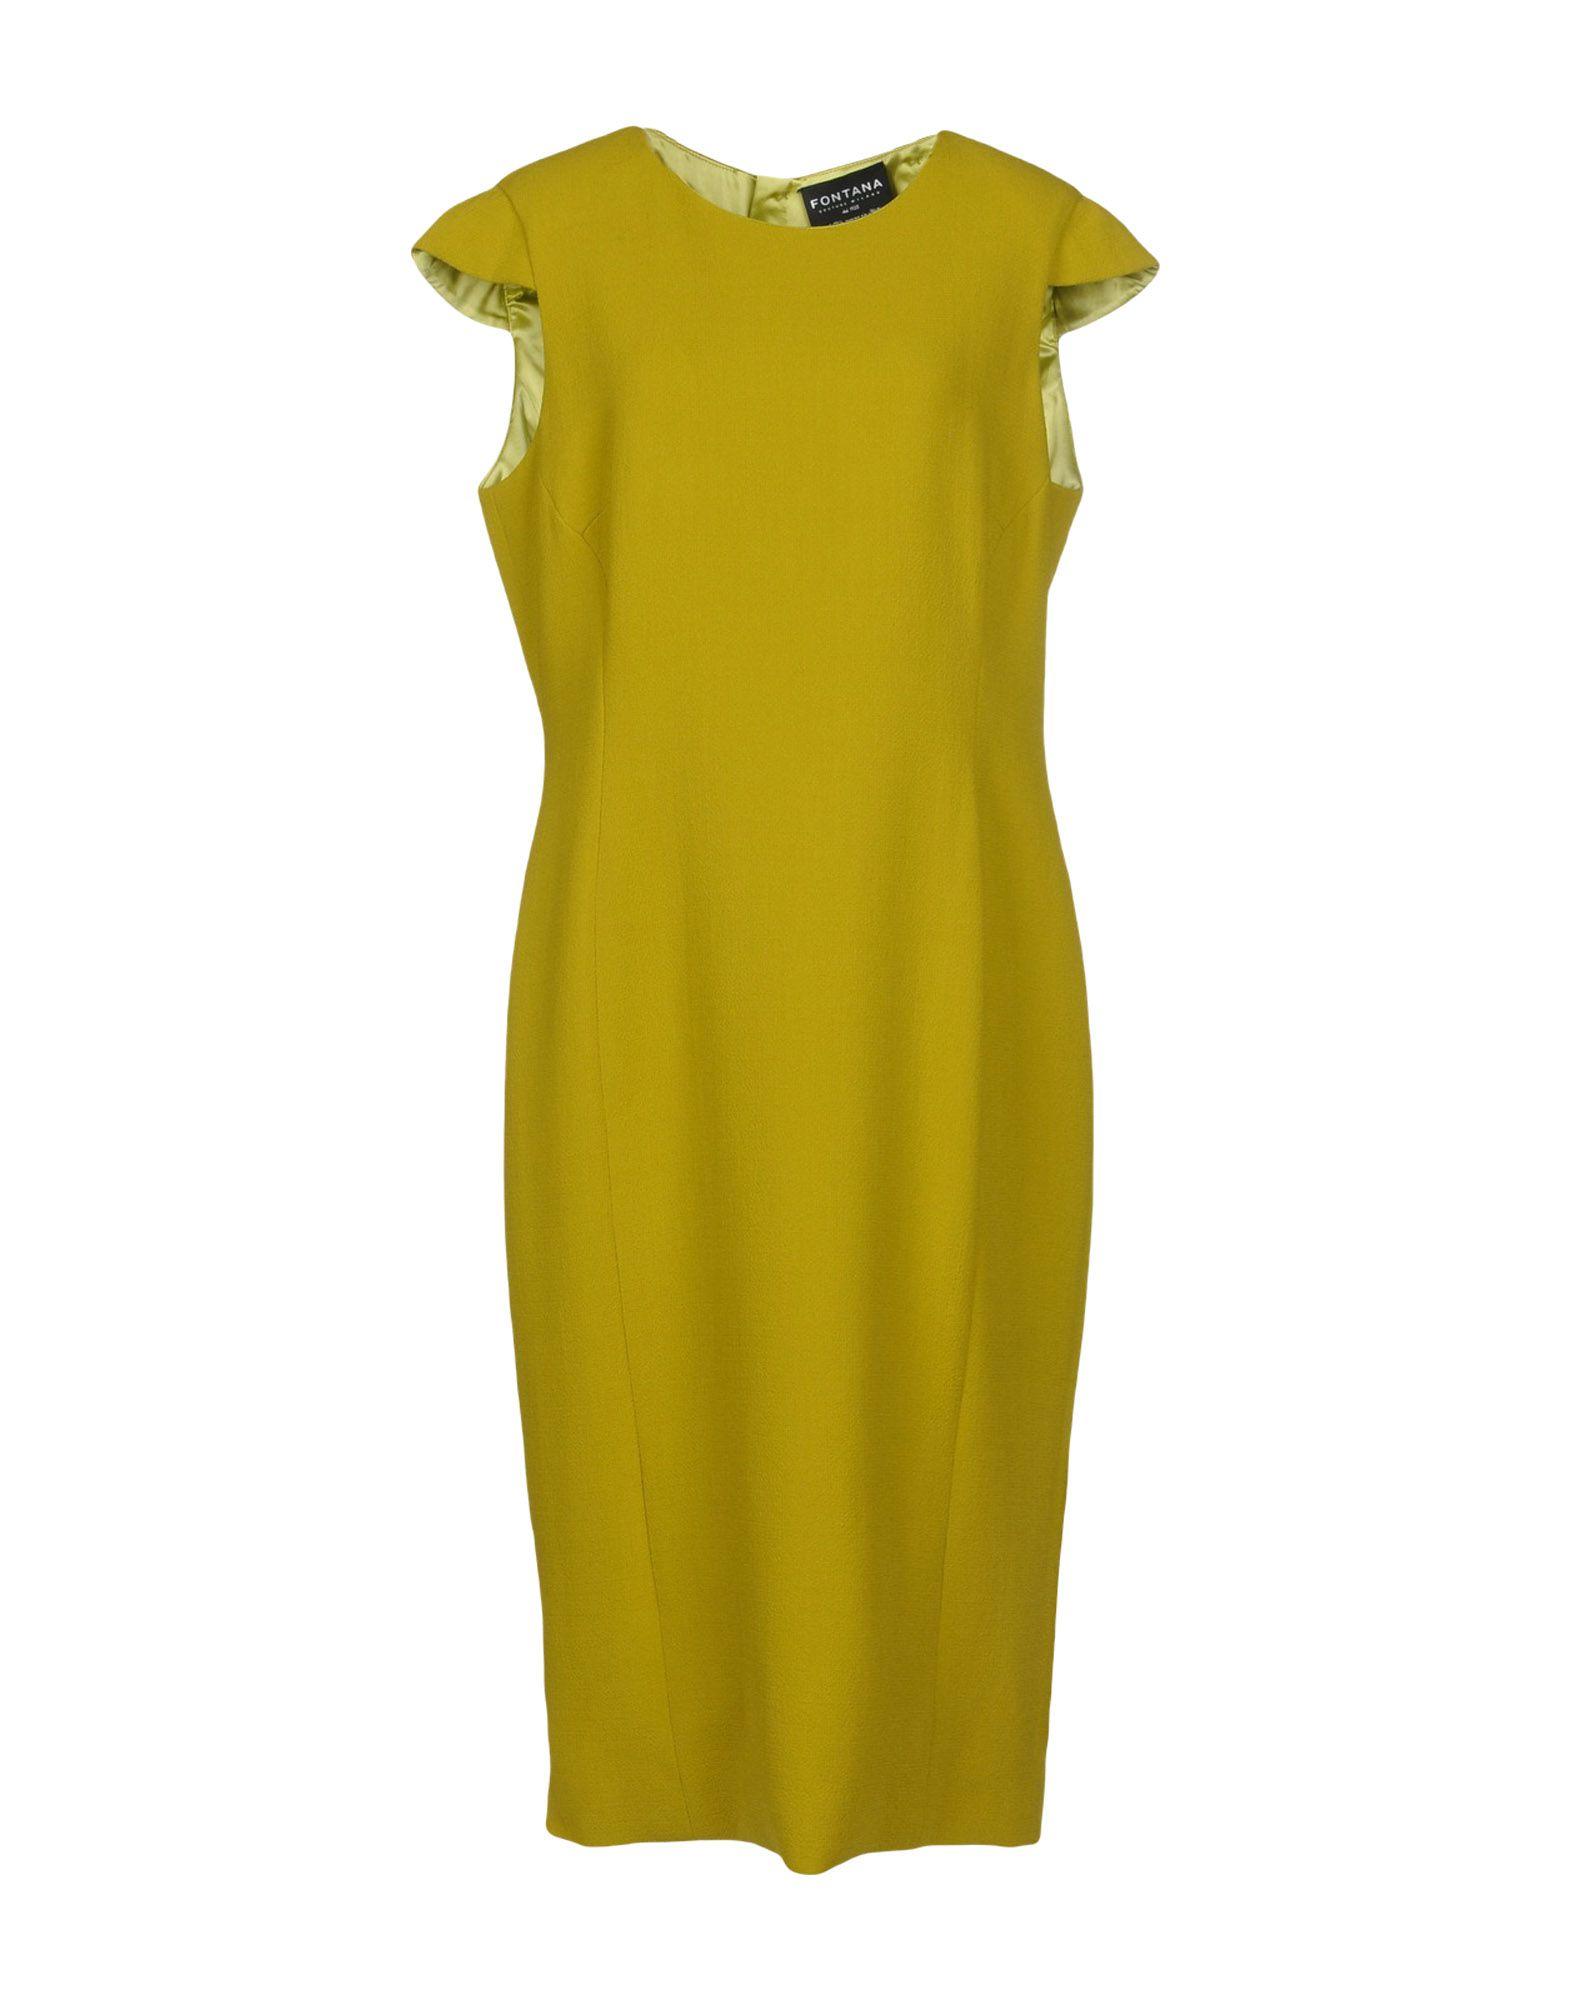 FONTANA COUTURE Платье длиной 3/4 moschino couture юбка длиной 3 4